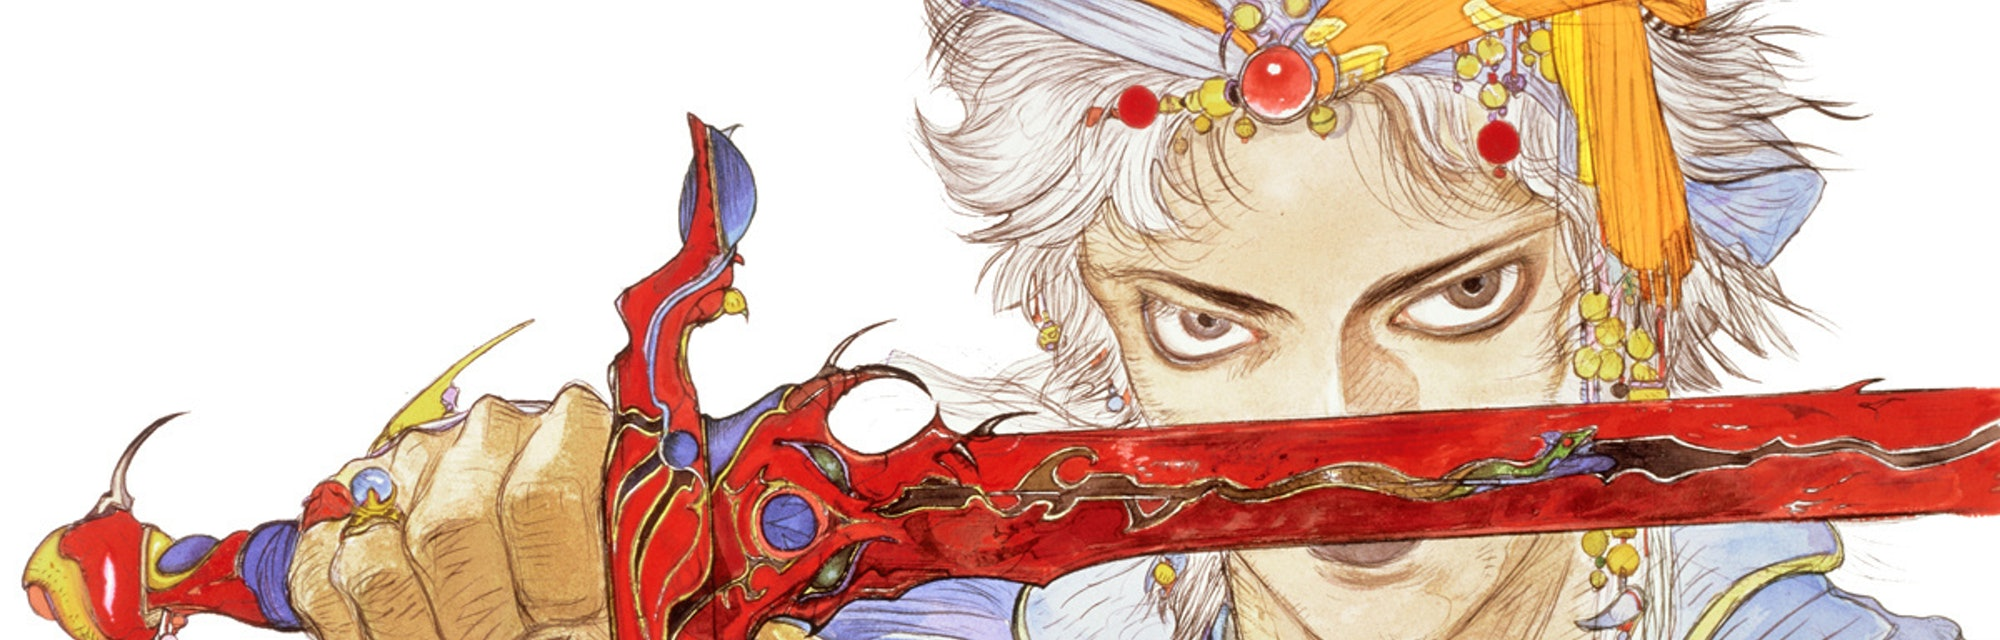 final fantasy 2 firion art amano